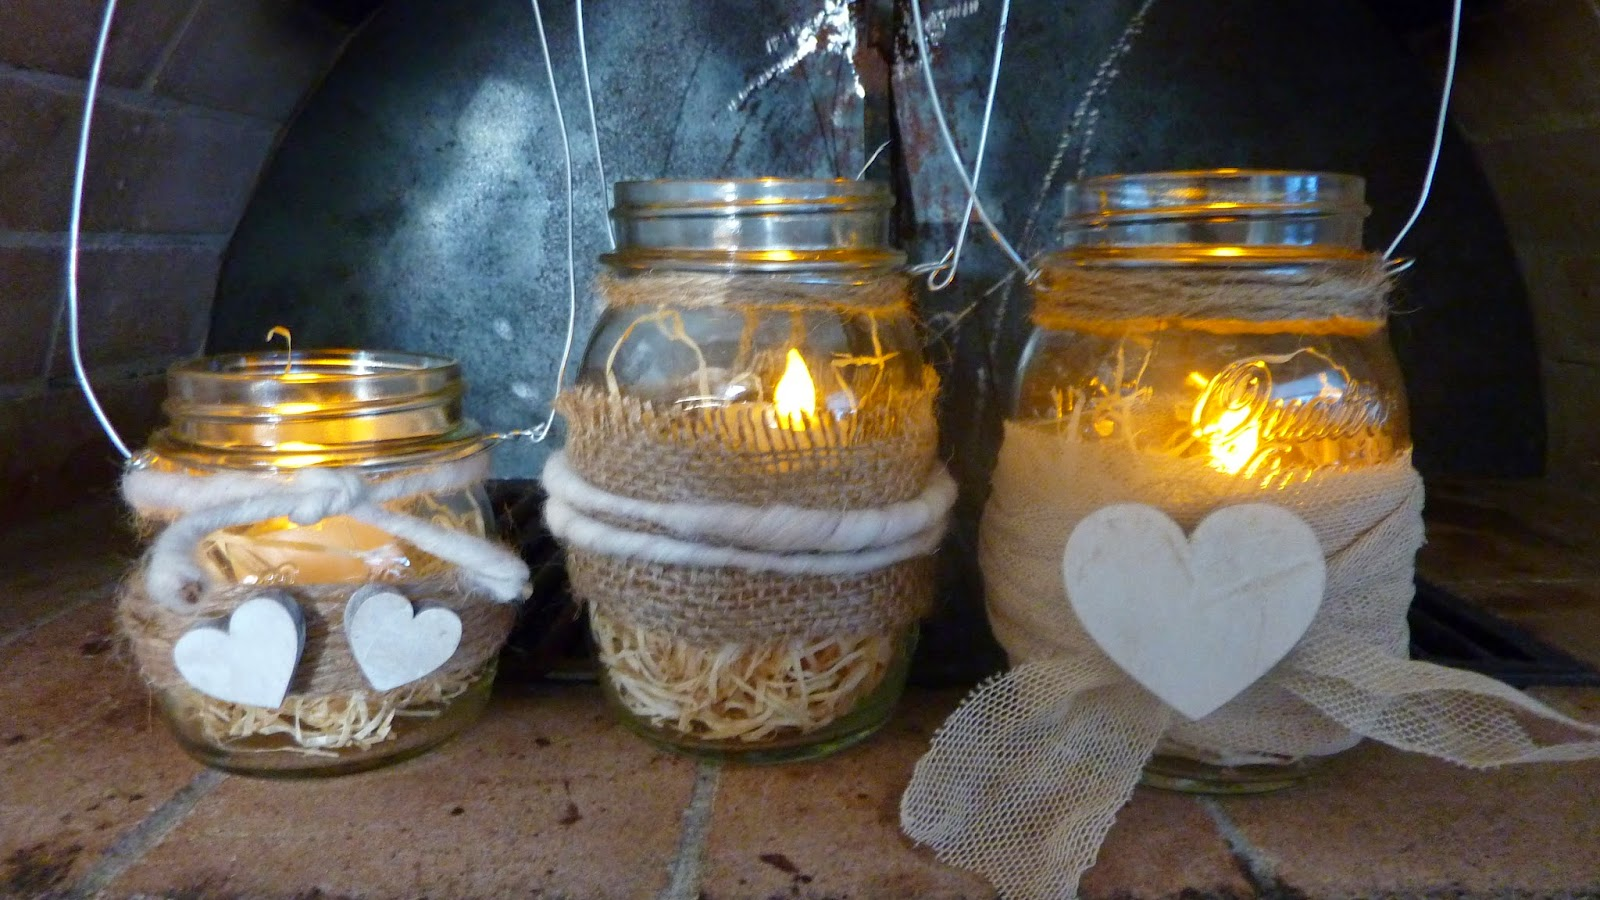 Candele shabby e portacandele fai da te ecco i nostri - Come fare le candele profumate in casa ...